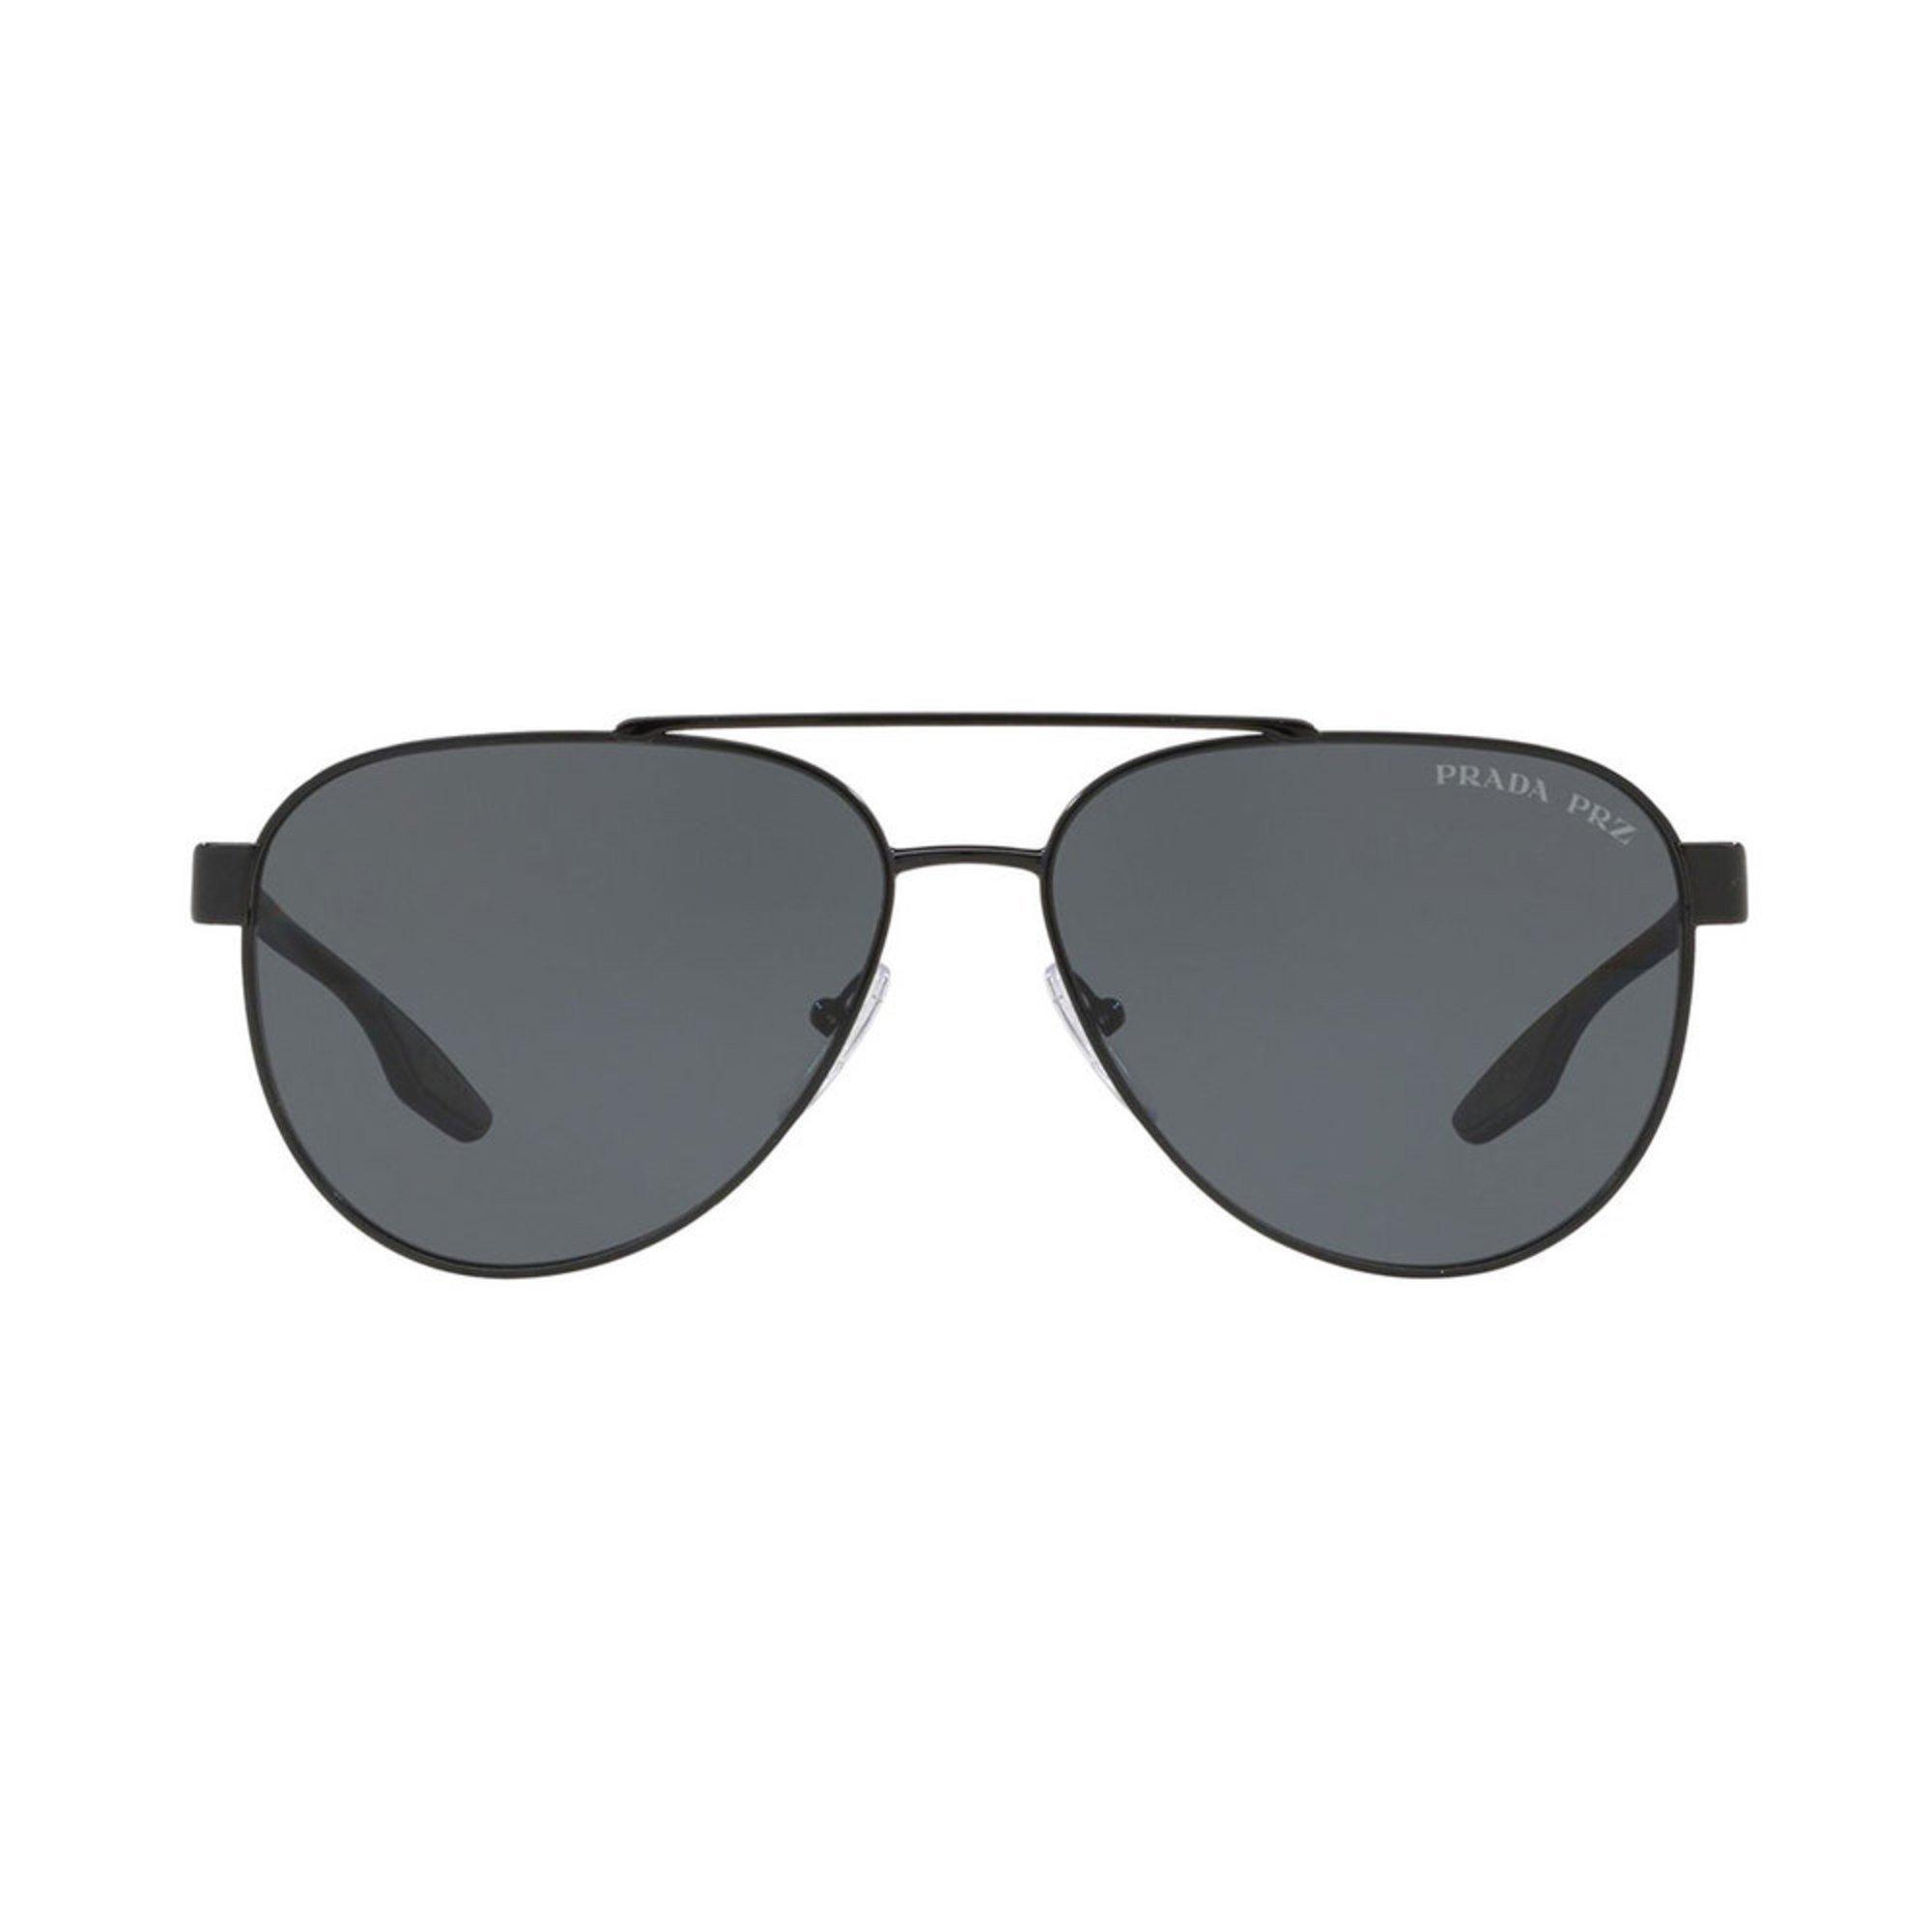 79ba25bdc03 Prada. Prada Men s Polarized Pilot Sunglasses